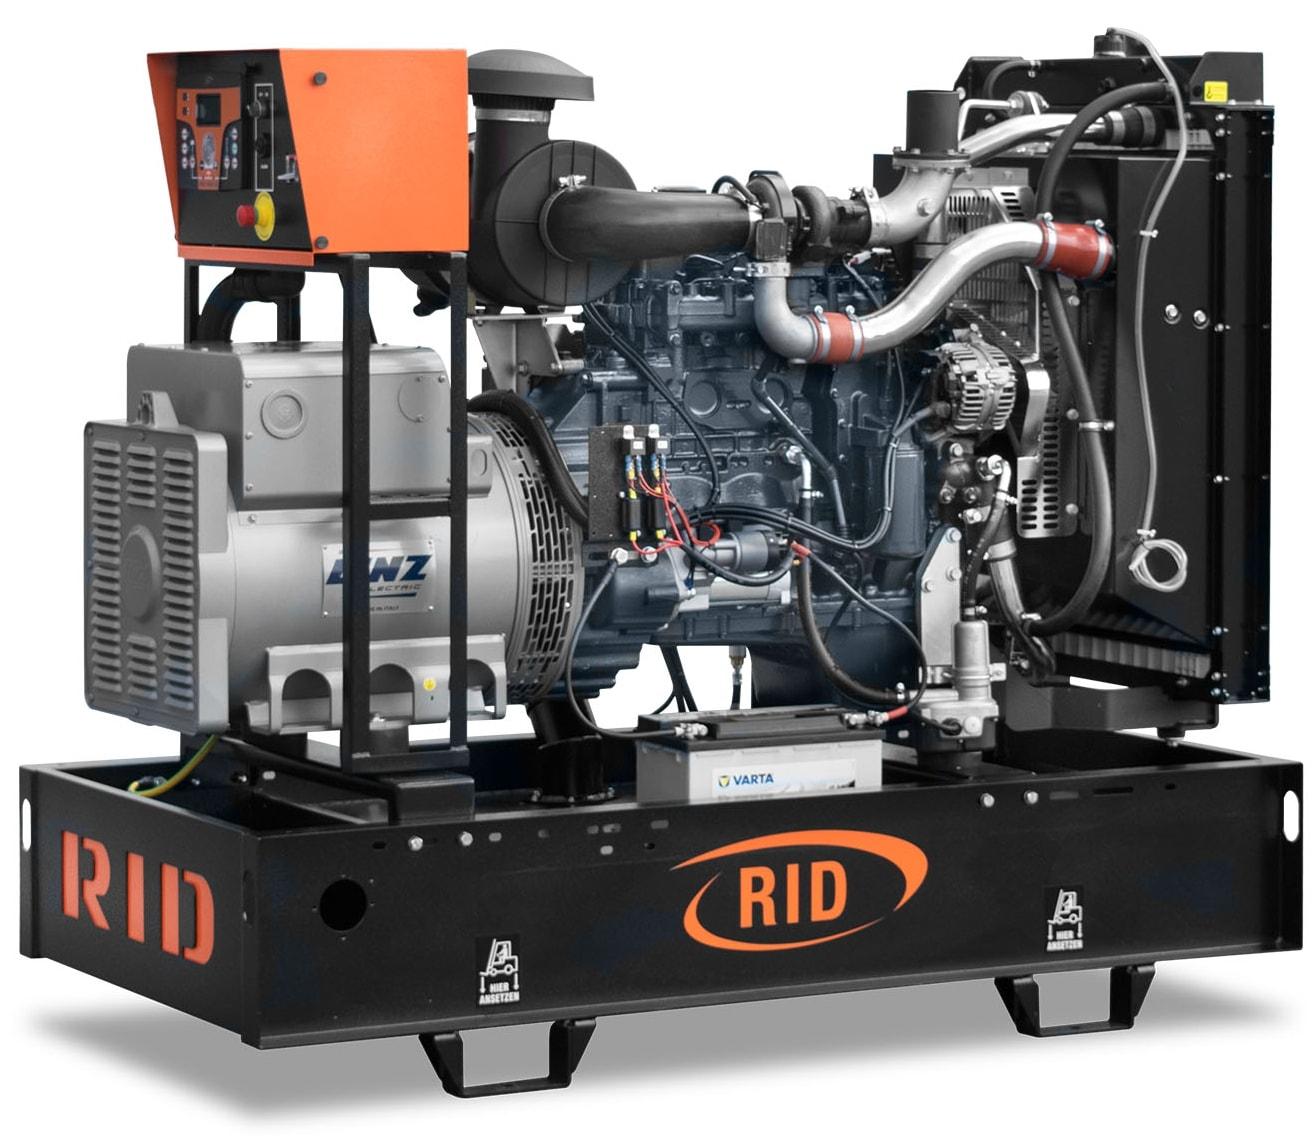 дизельная электростанция rid 120 c-series